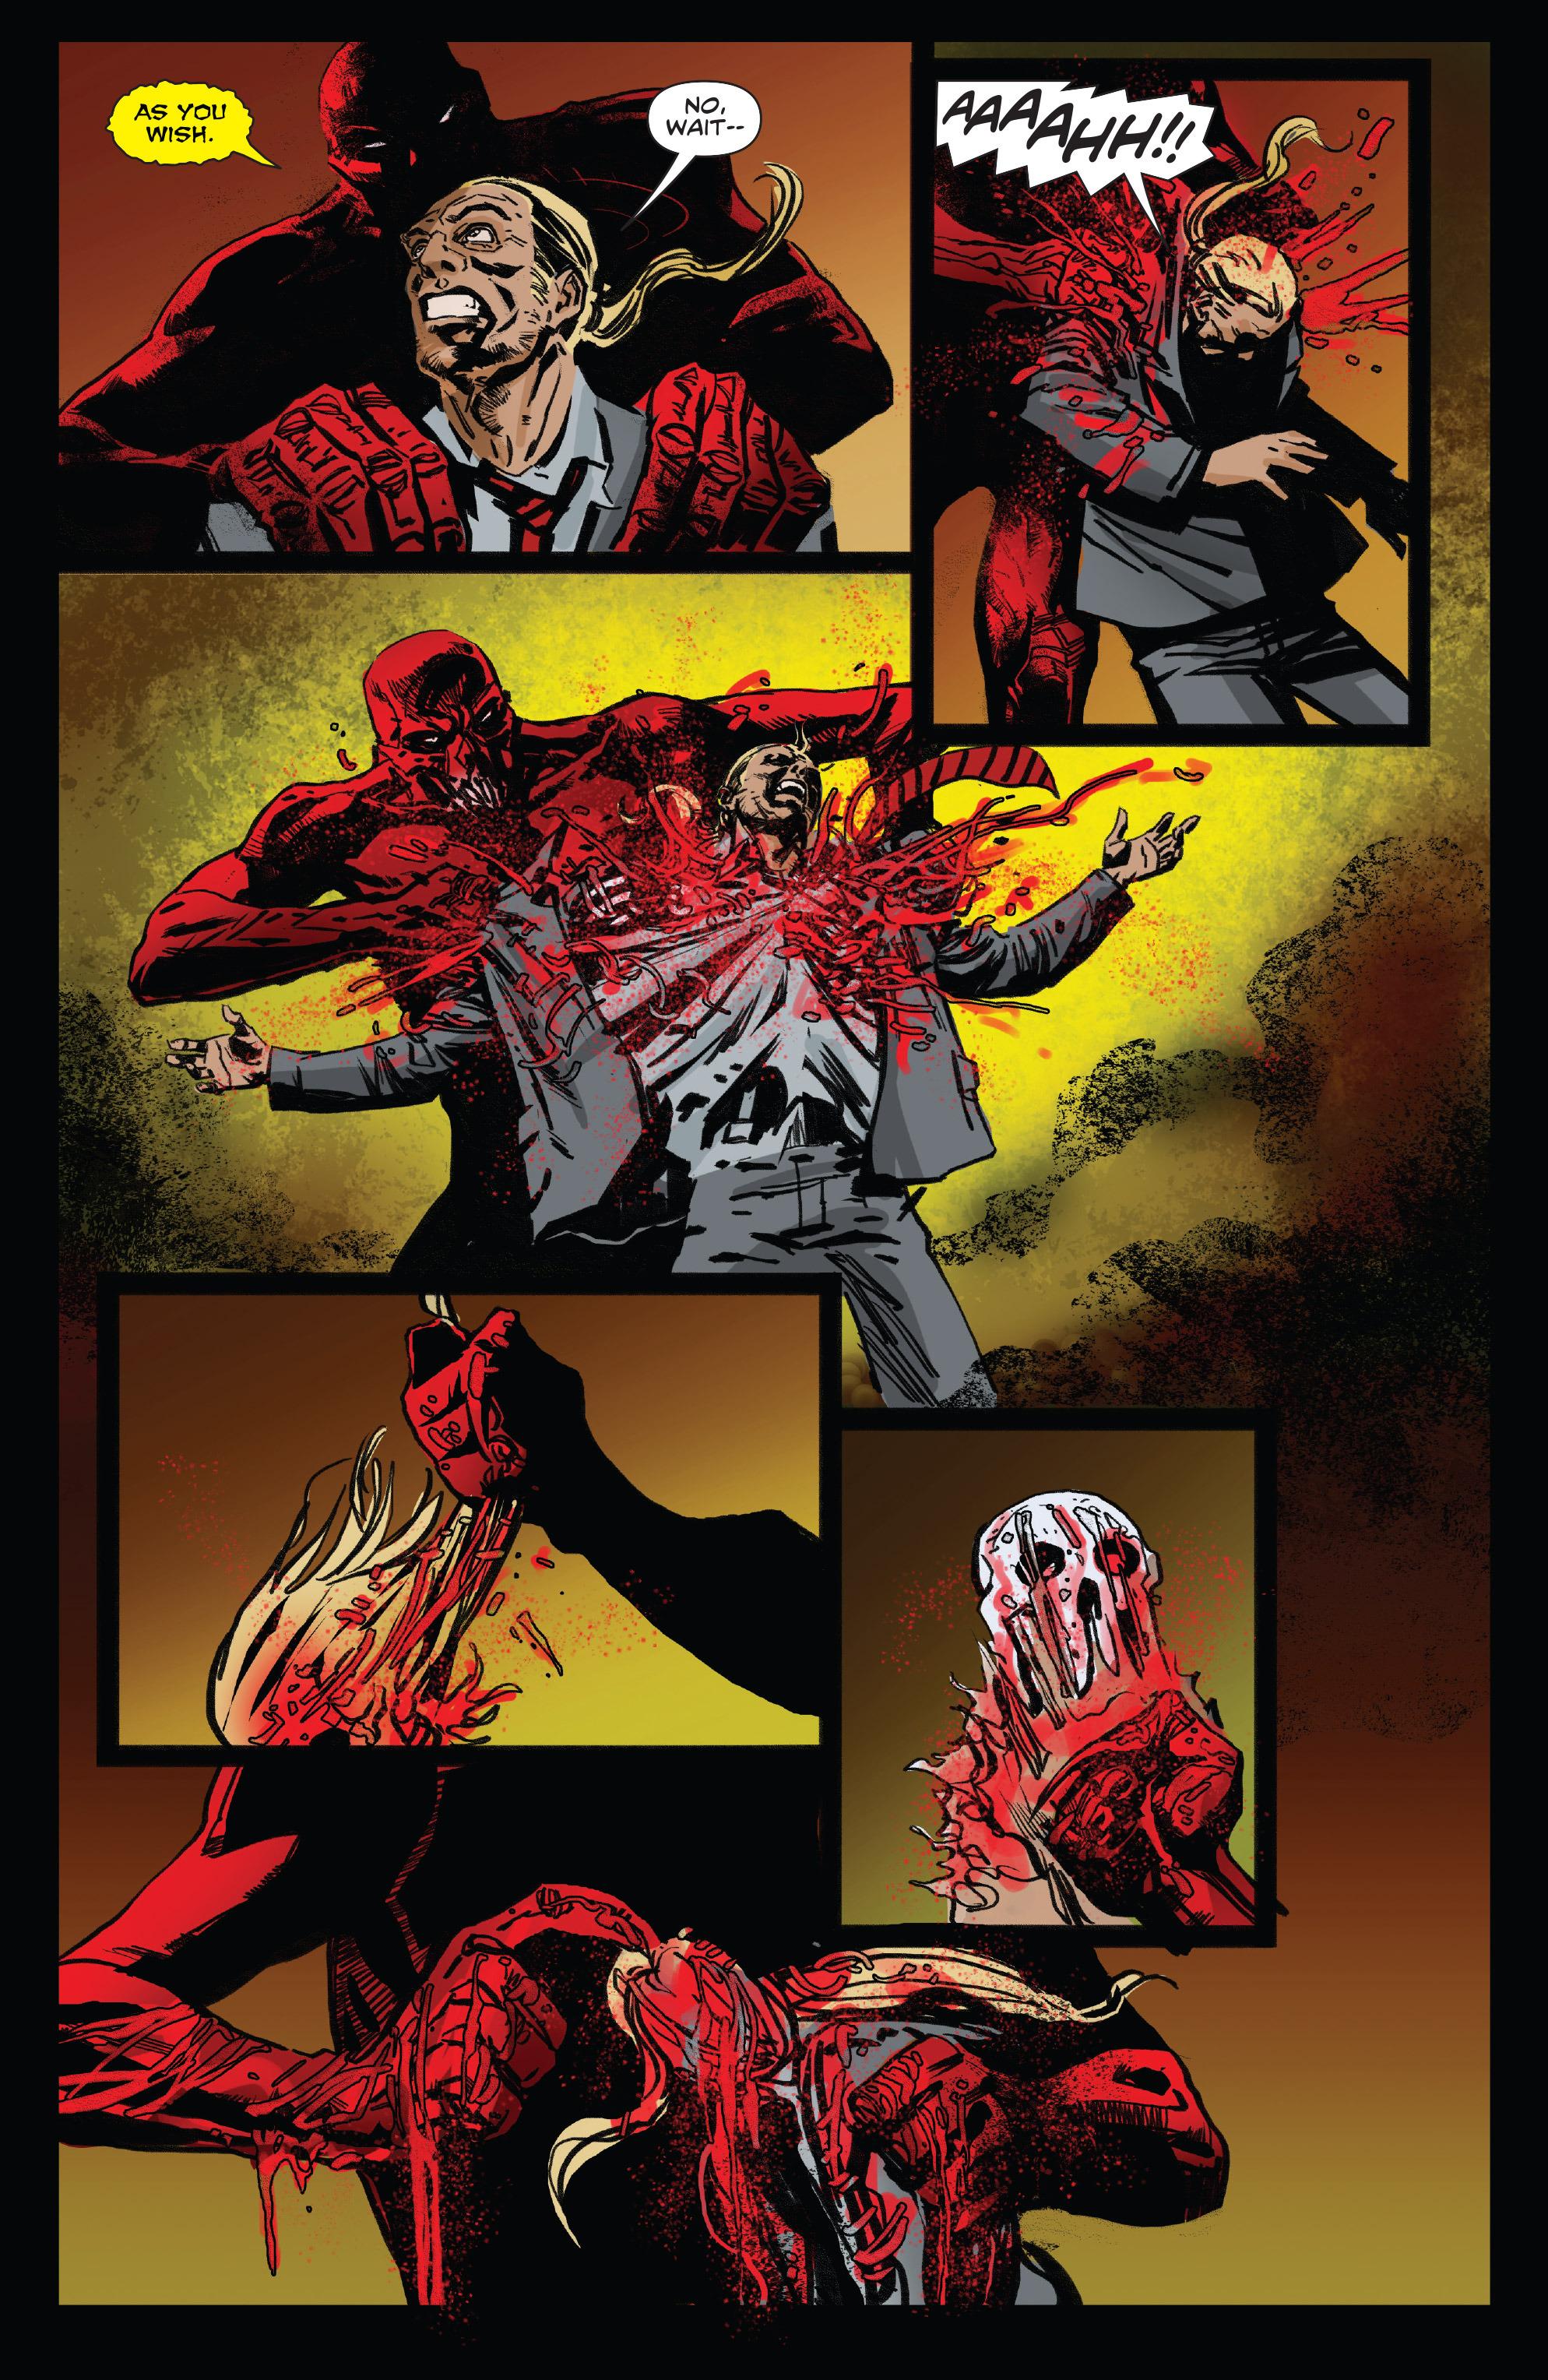 Read online Clive Barker's Hellraiser: The Dark Watch comic -  Issue # TPB 3 - 30